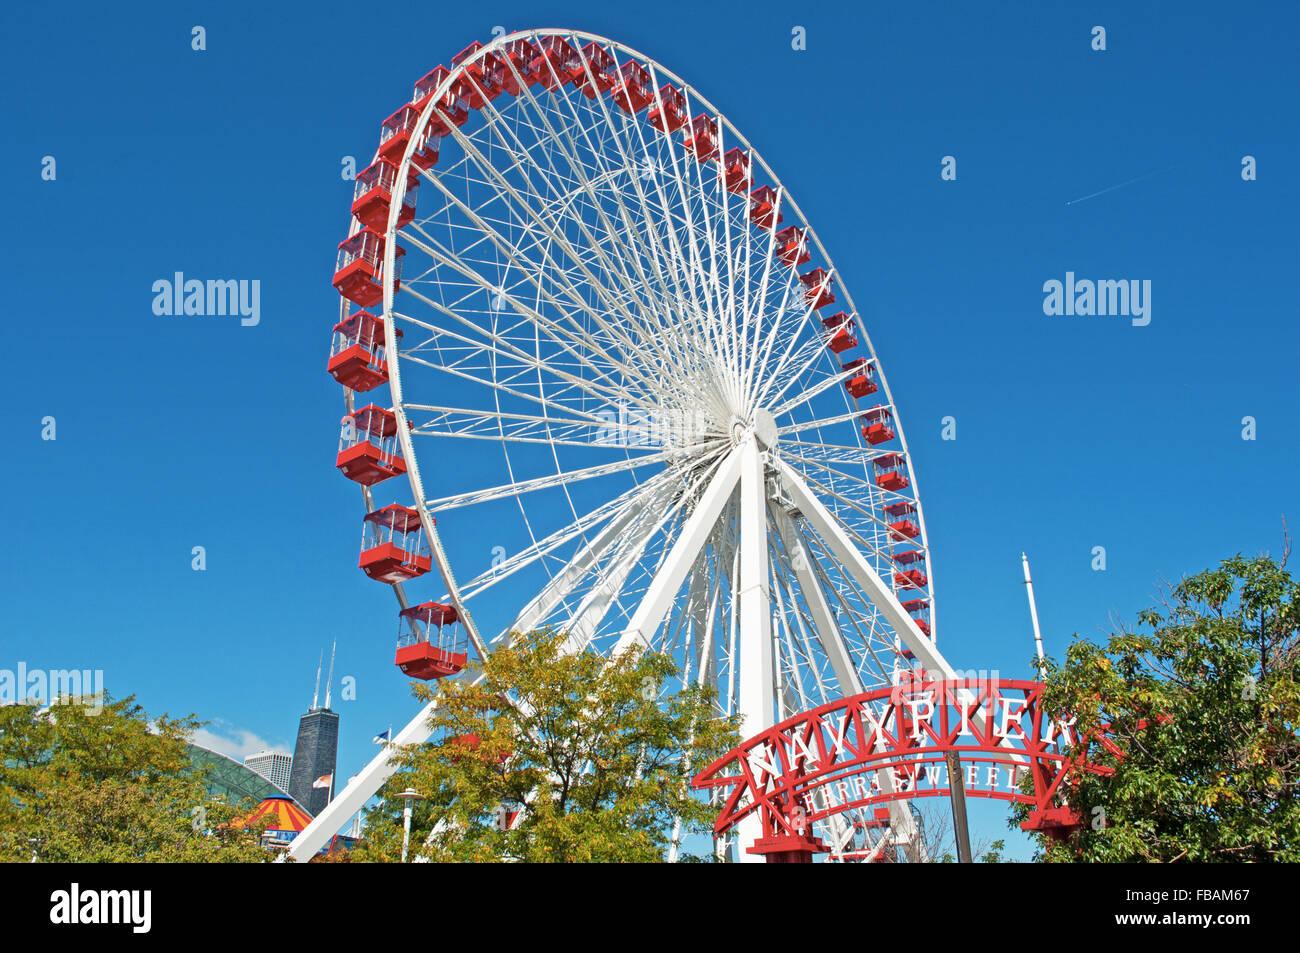 Landmark Symbol Symbolic Ferris Wheel High Resolution Stock Photography And Images Alamy